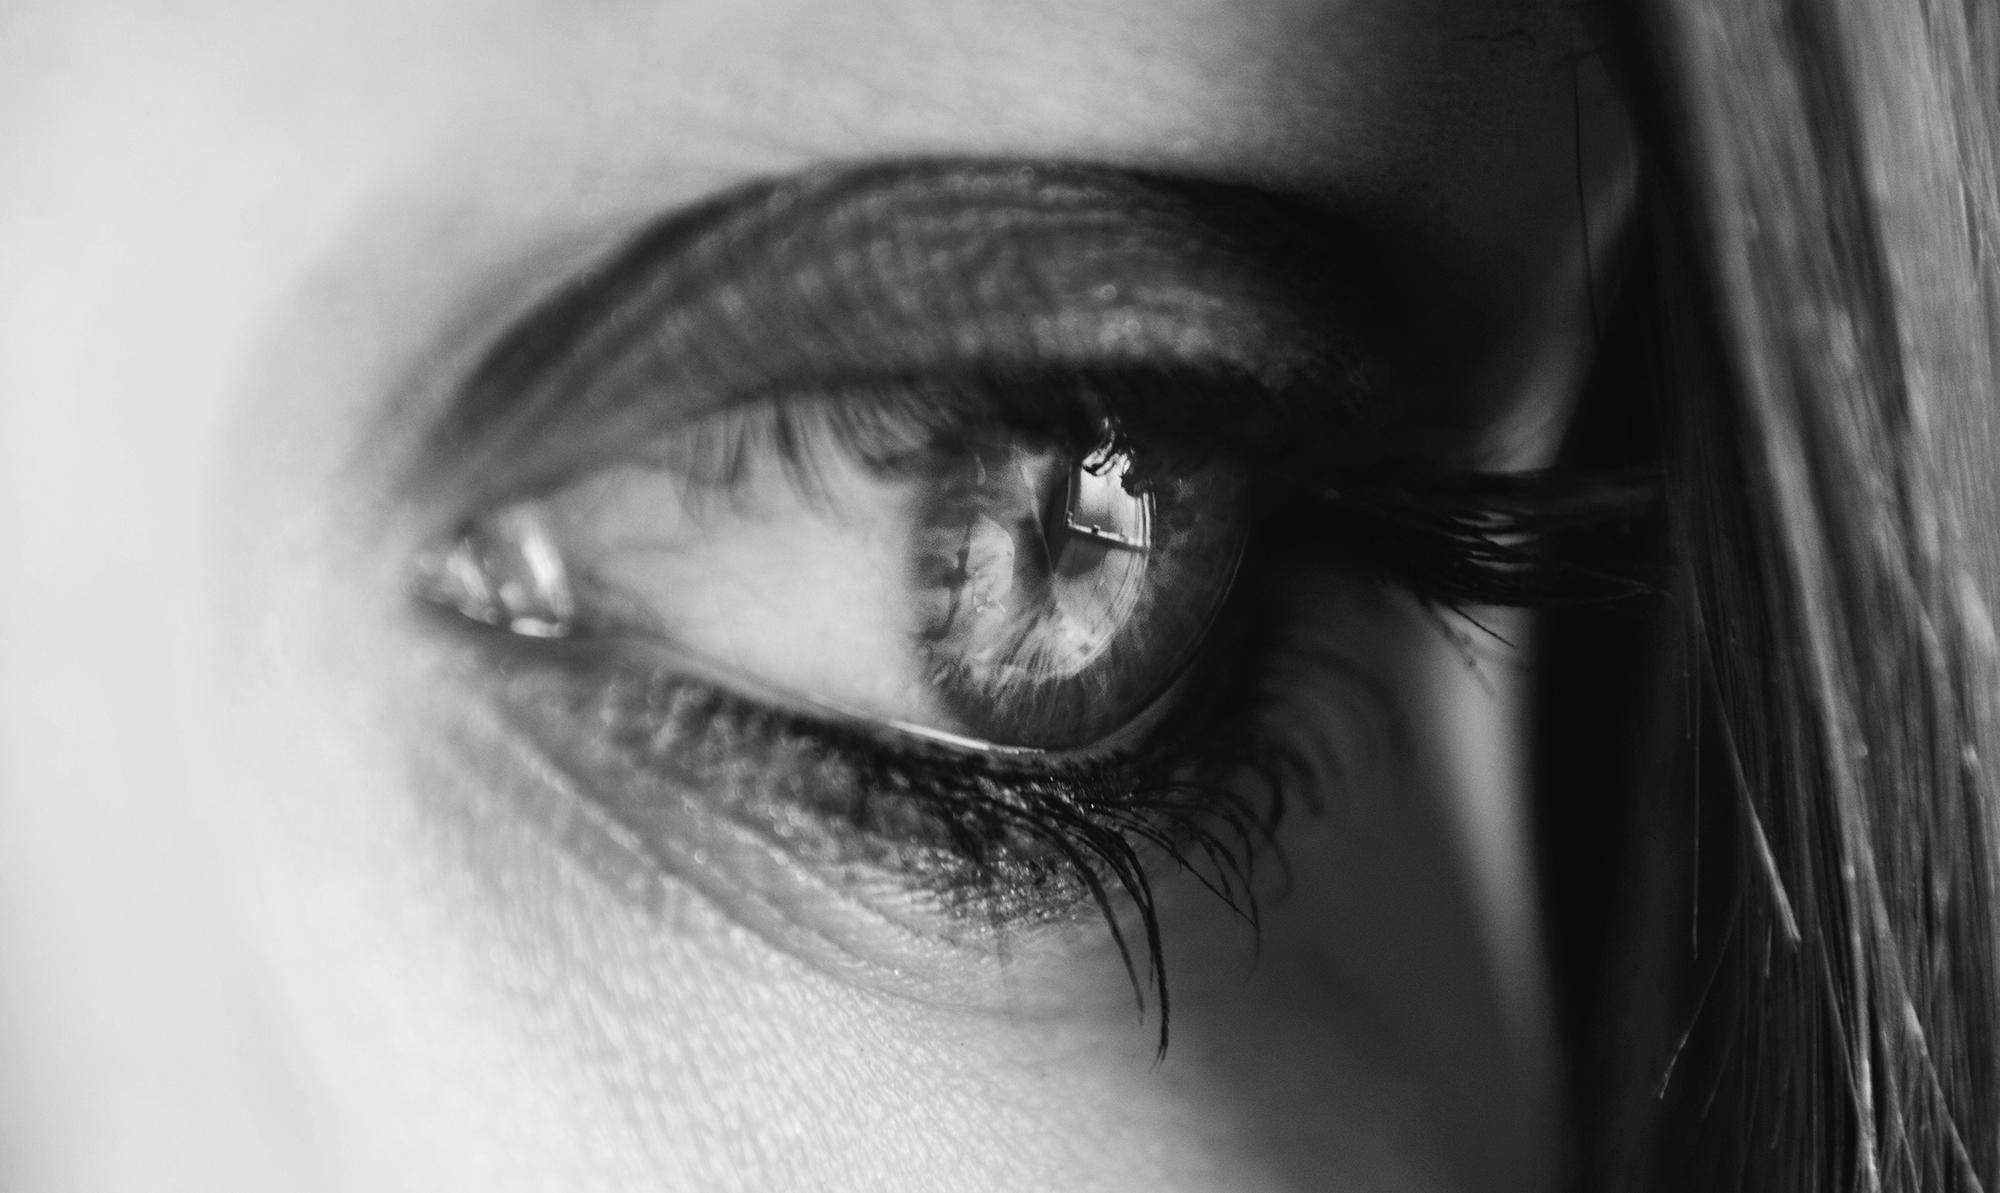 fernando olho